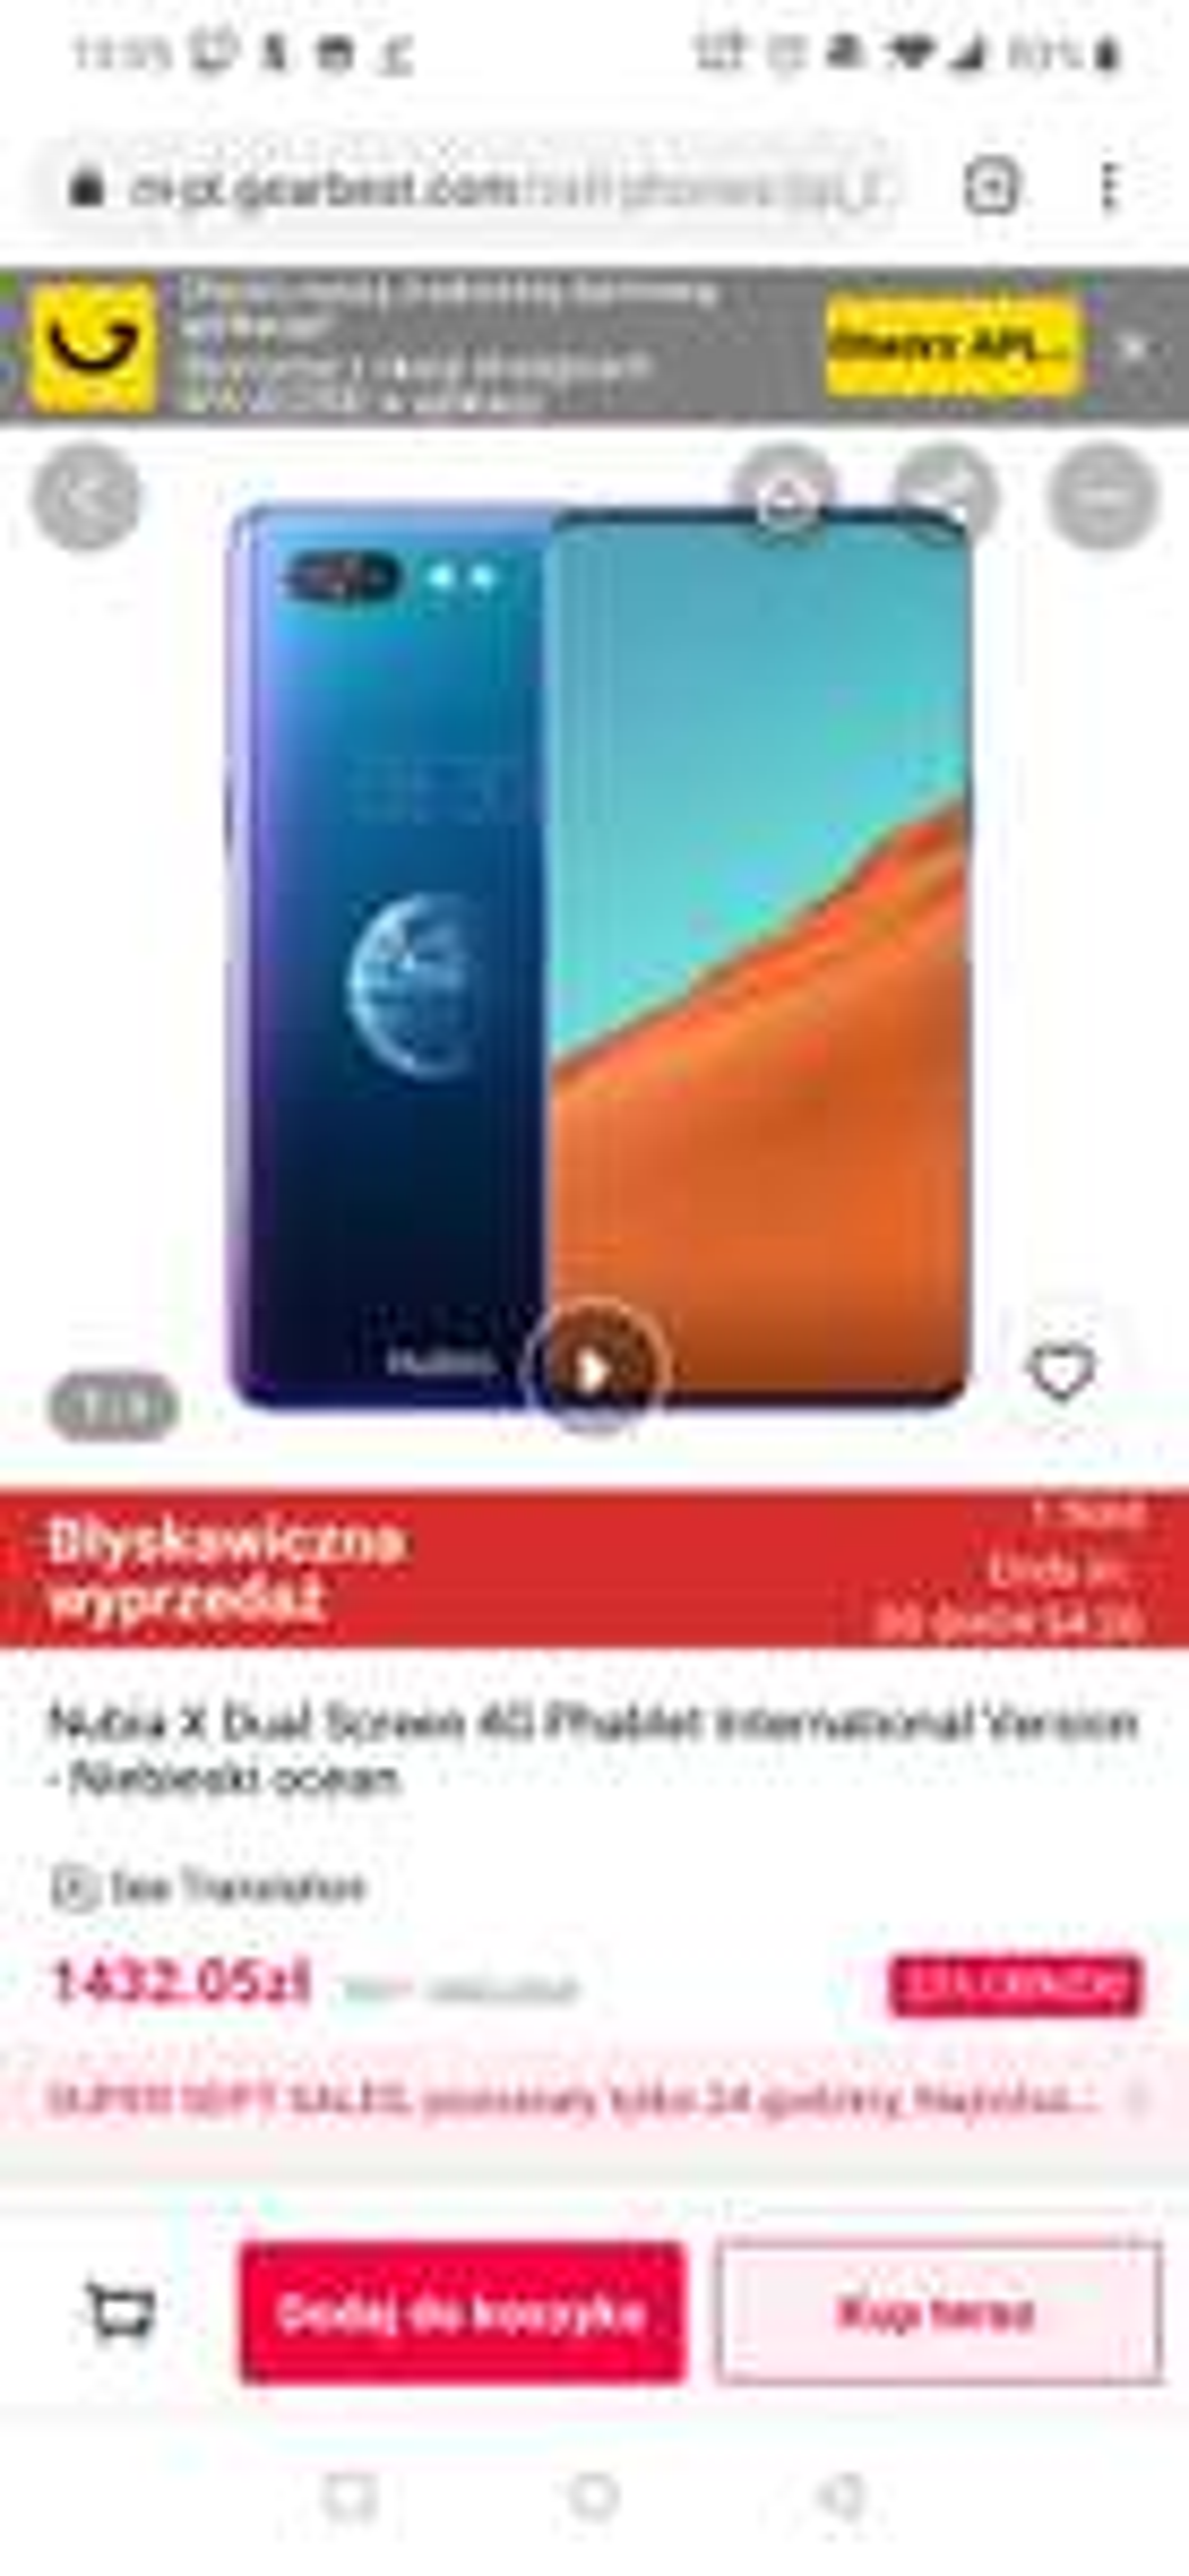 ZTE Nubia X 8/128 Snapdragon 845, Dual Screen, international version